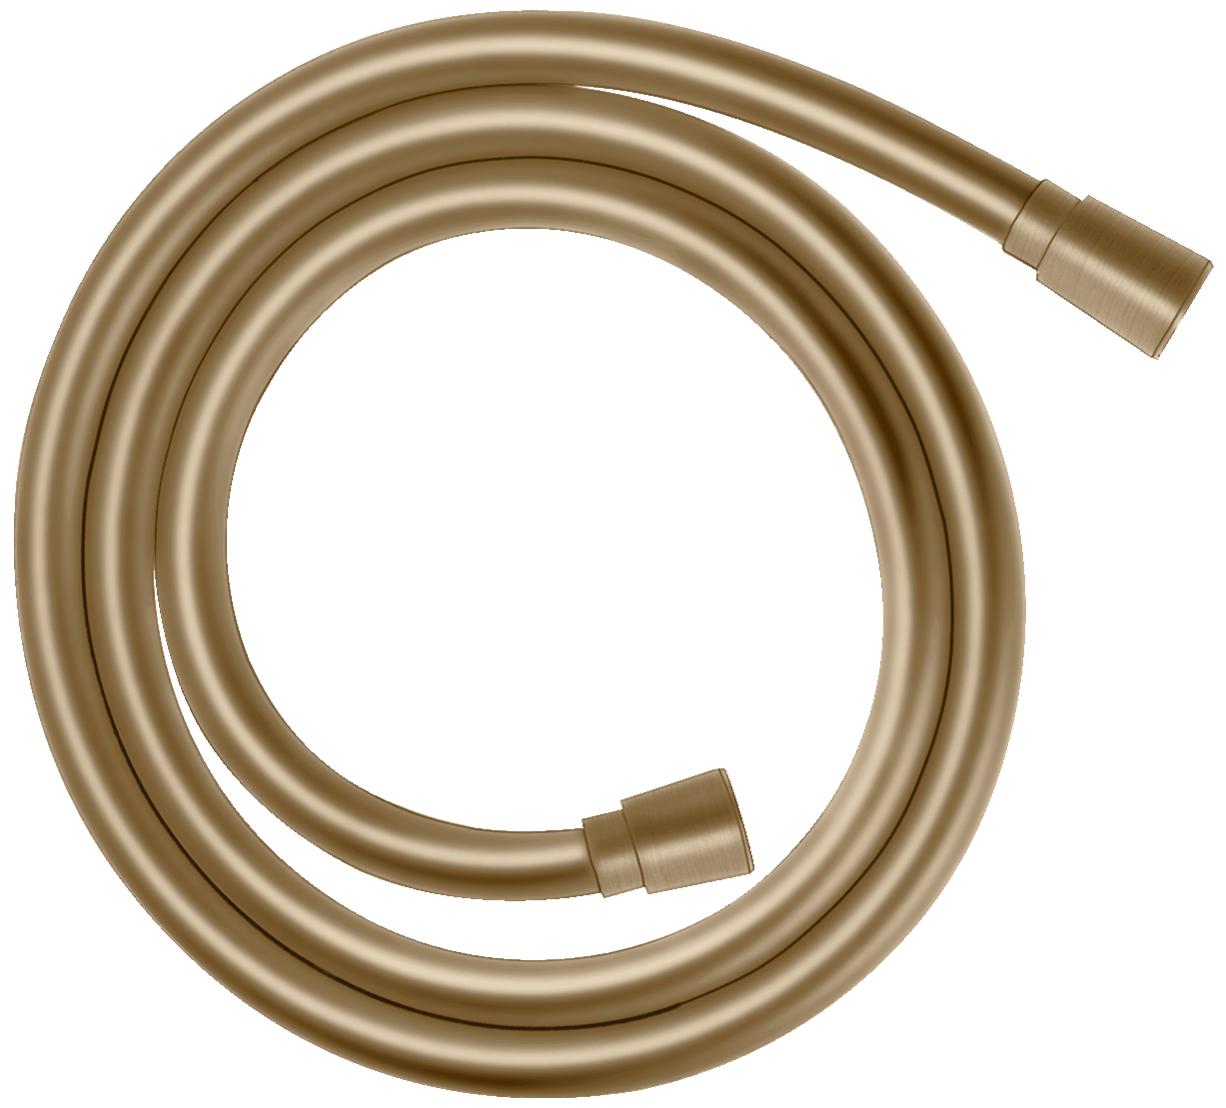 Flexible de douche Hansgrohe Isiflex 1,60 m en bronze brossé